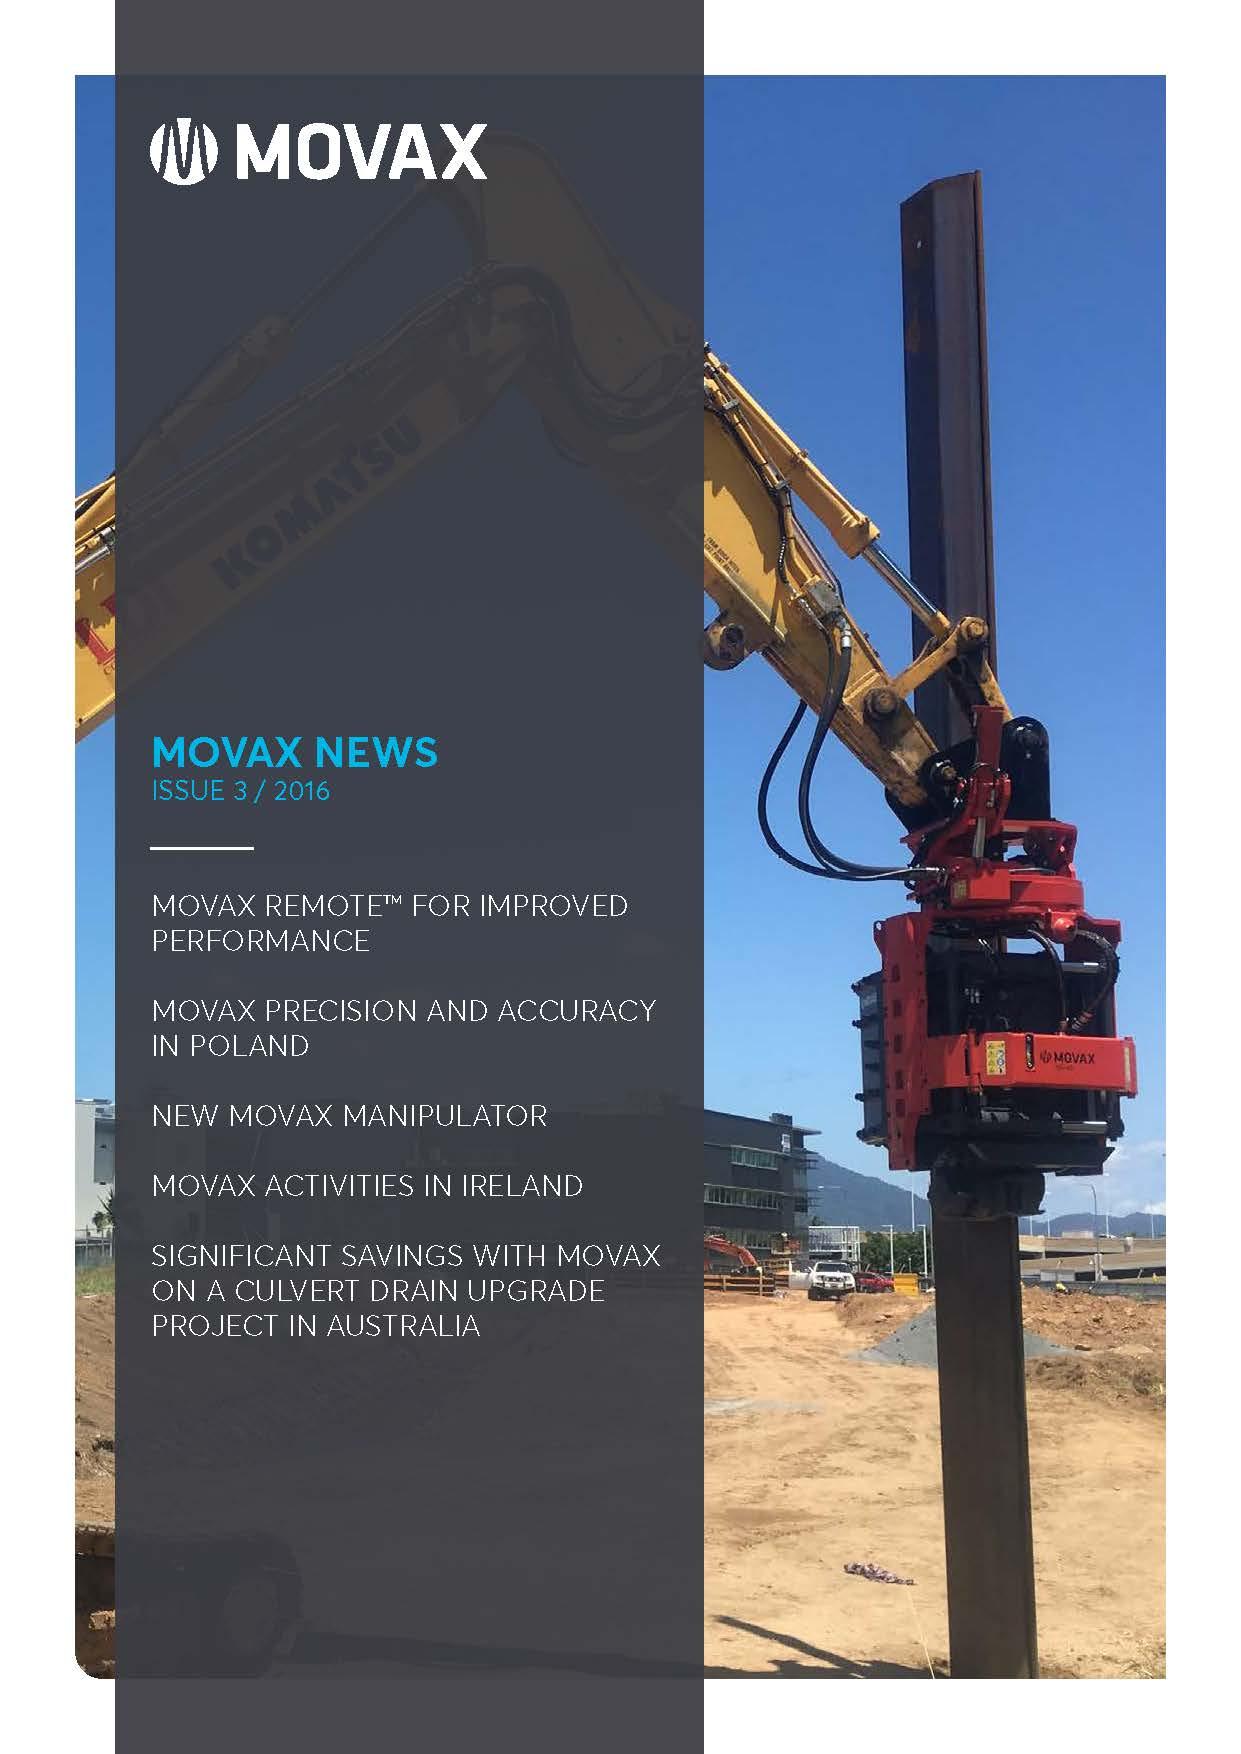 Movax News 03/2016